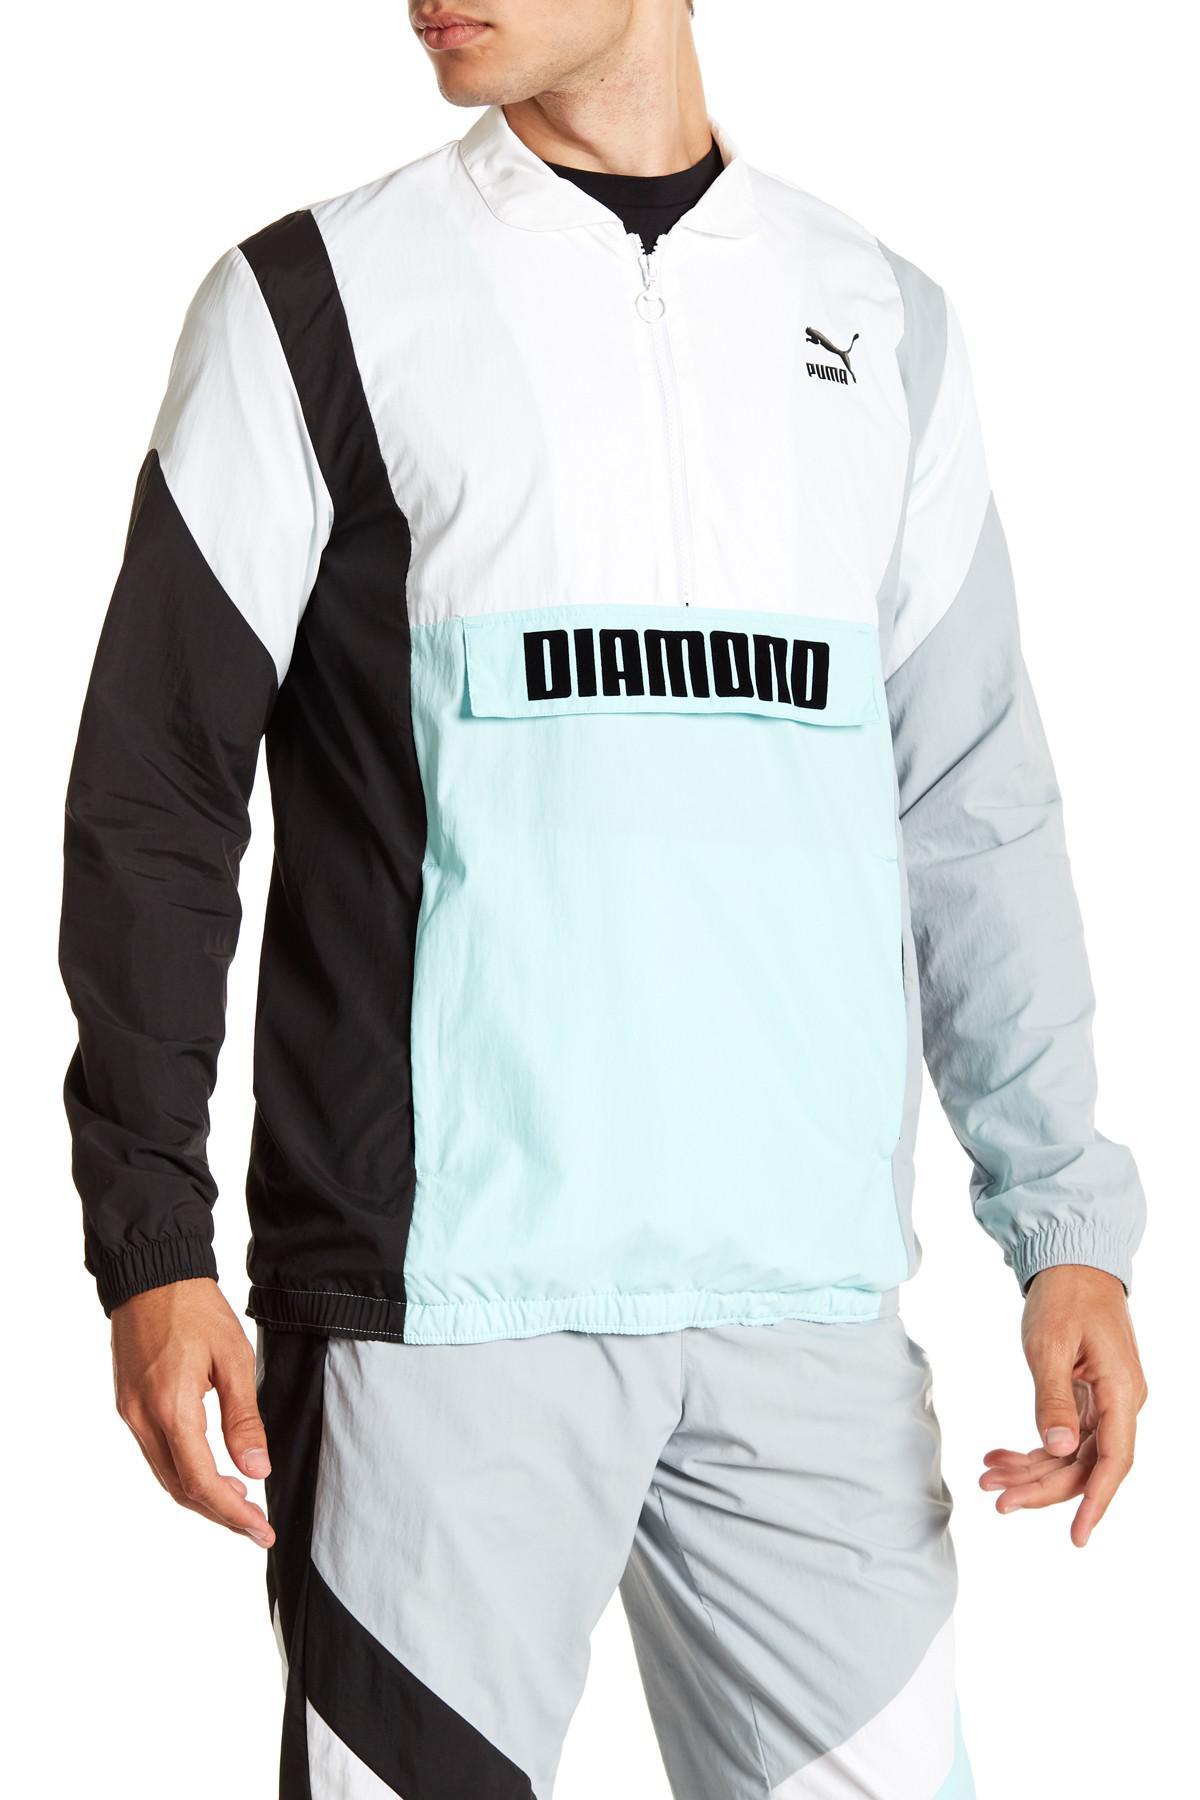 Lyst - Puma Diamond Savannah Jacket for Men 1ea0387262d7e